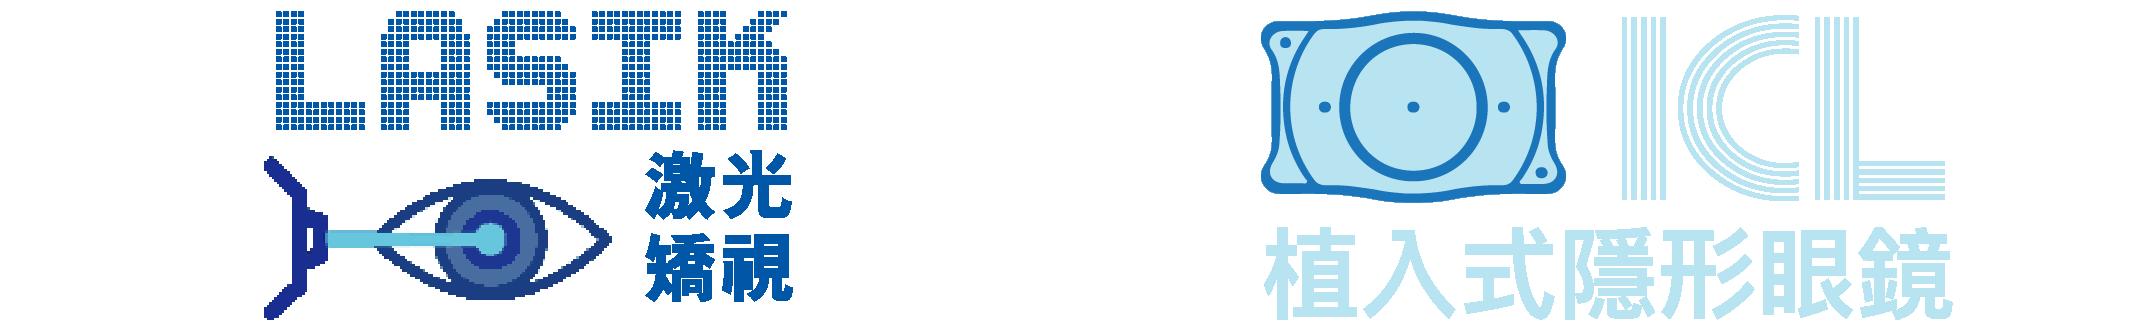 lasik & ICL logo